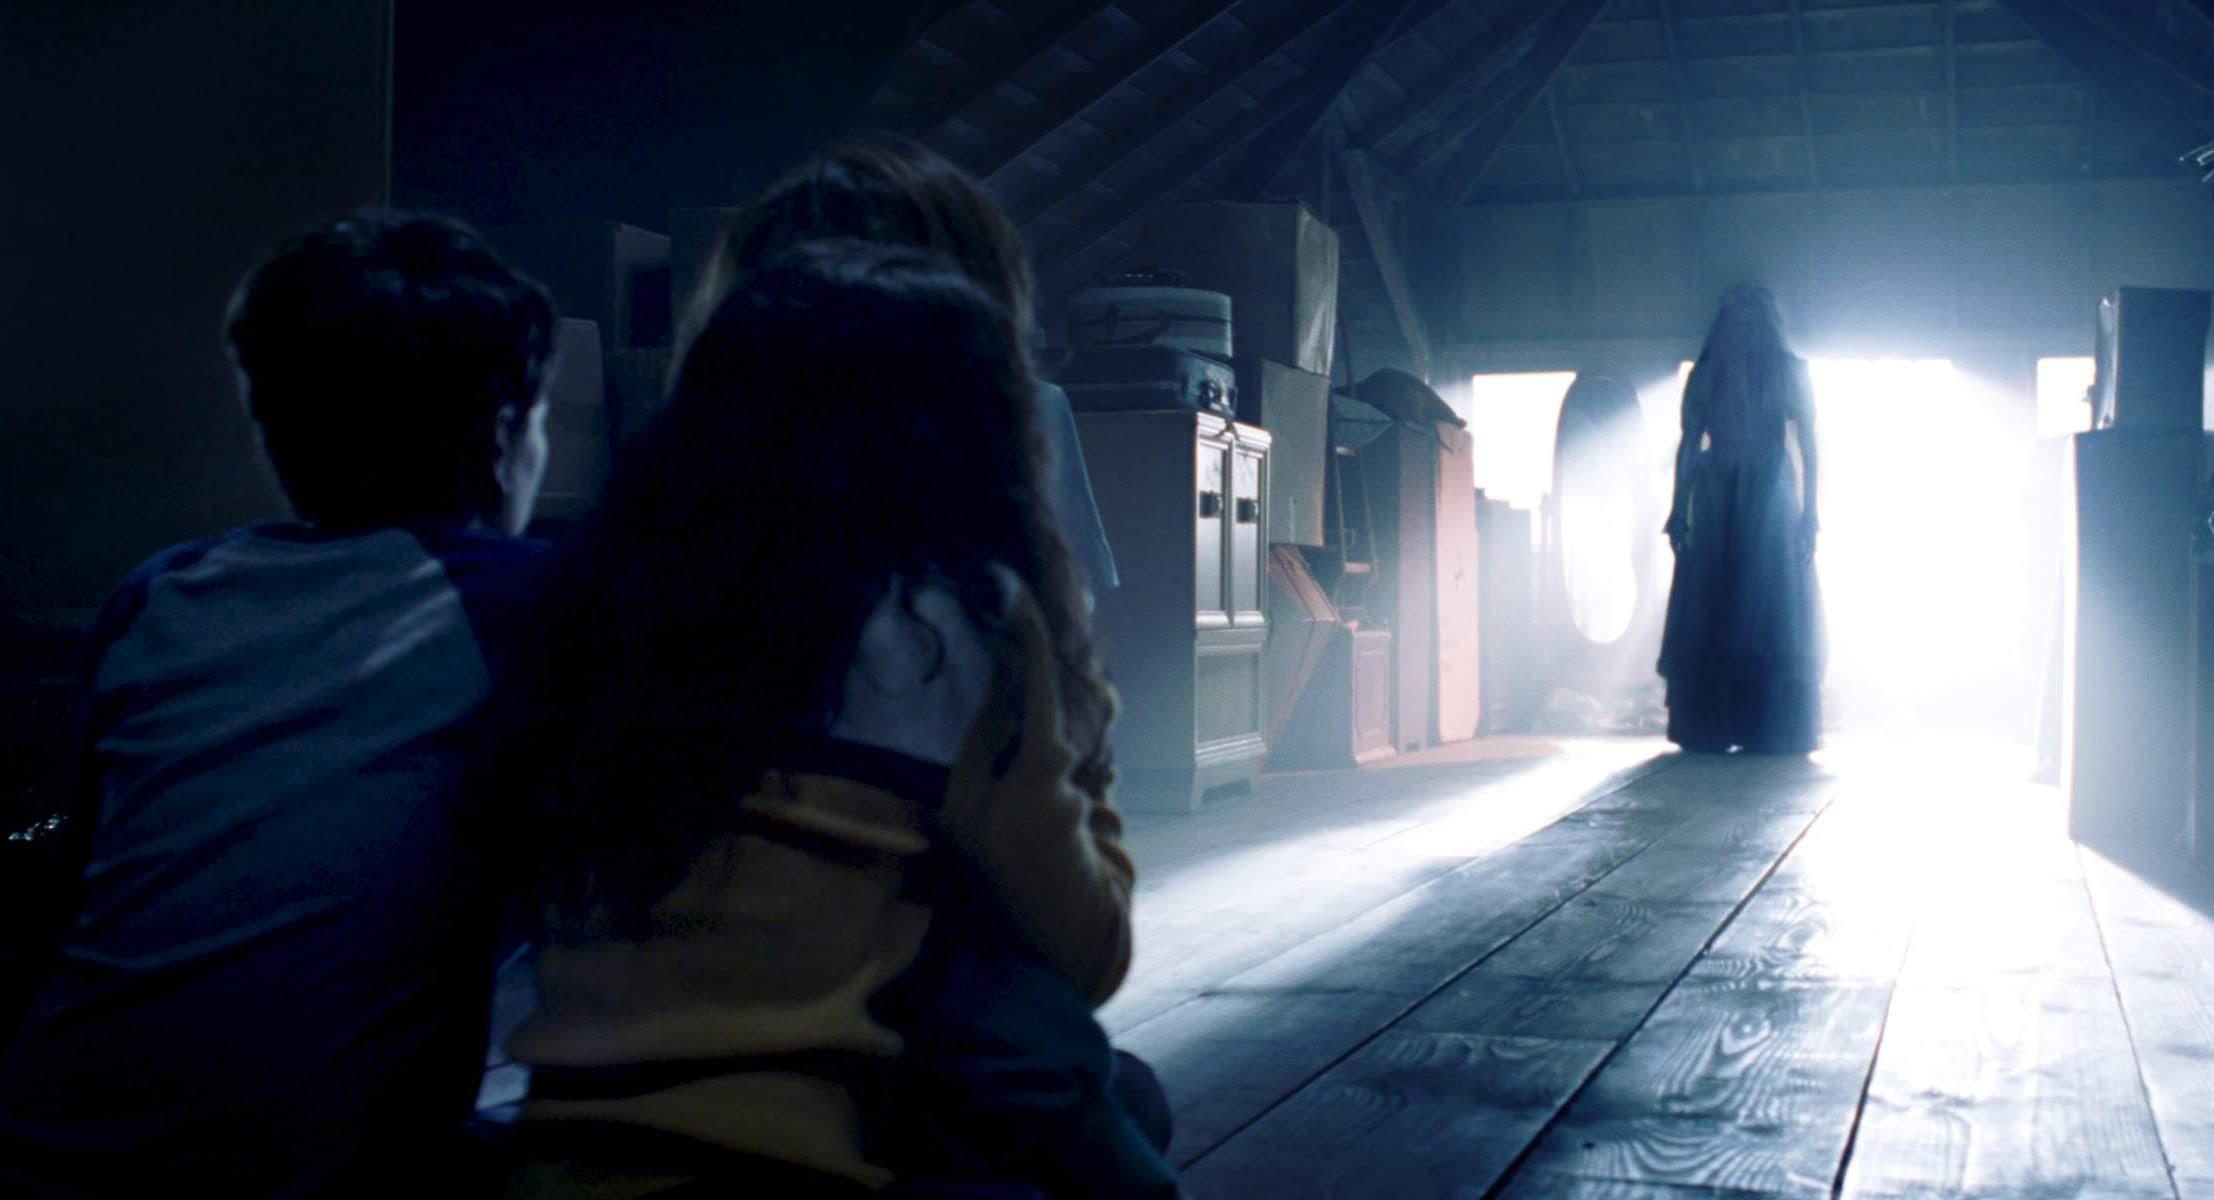 The Curse of La Llorona :「アクアマン」も大ヒットのジェームズ・ワン監督がホラー映画の達人として、プロデュースを手がけた注目作「ザ・カース・オブ・ラ・ヨローナ」の新しい予告編 ! !